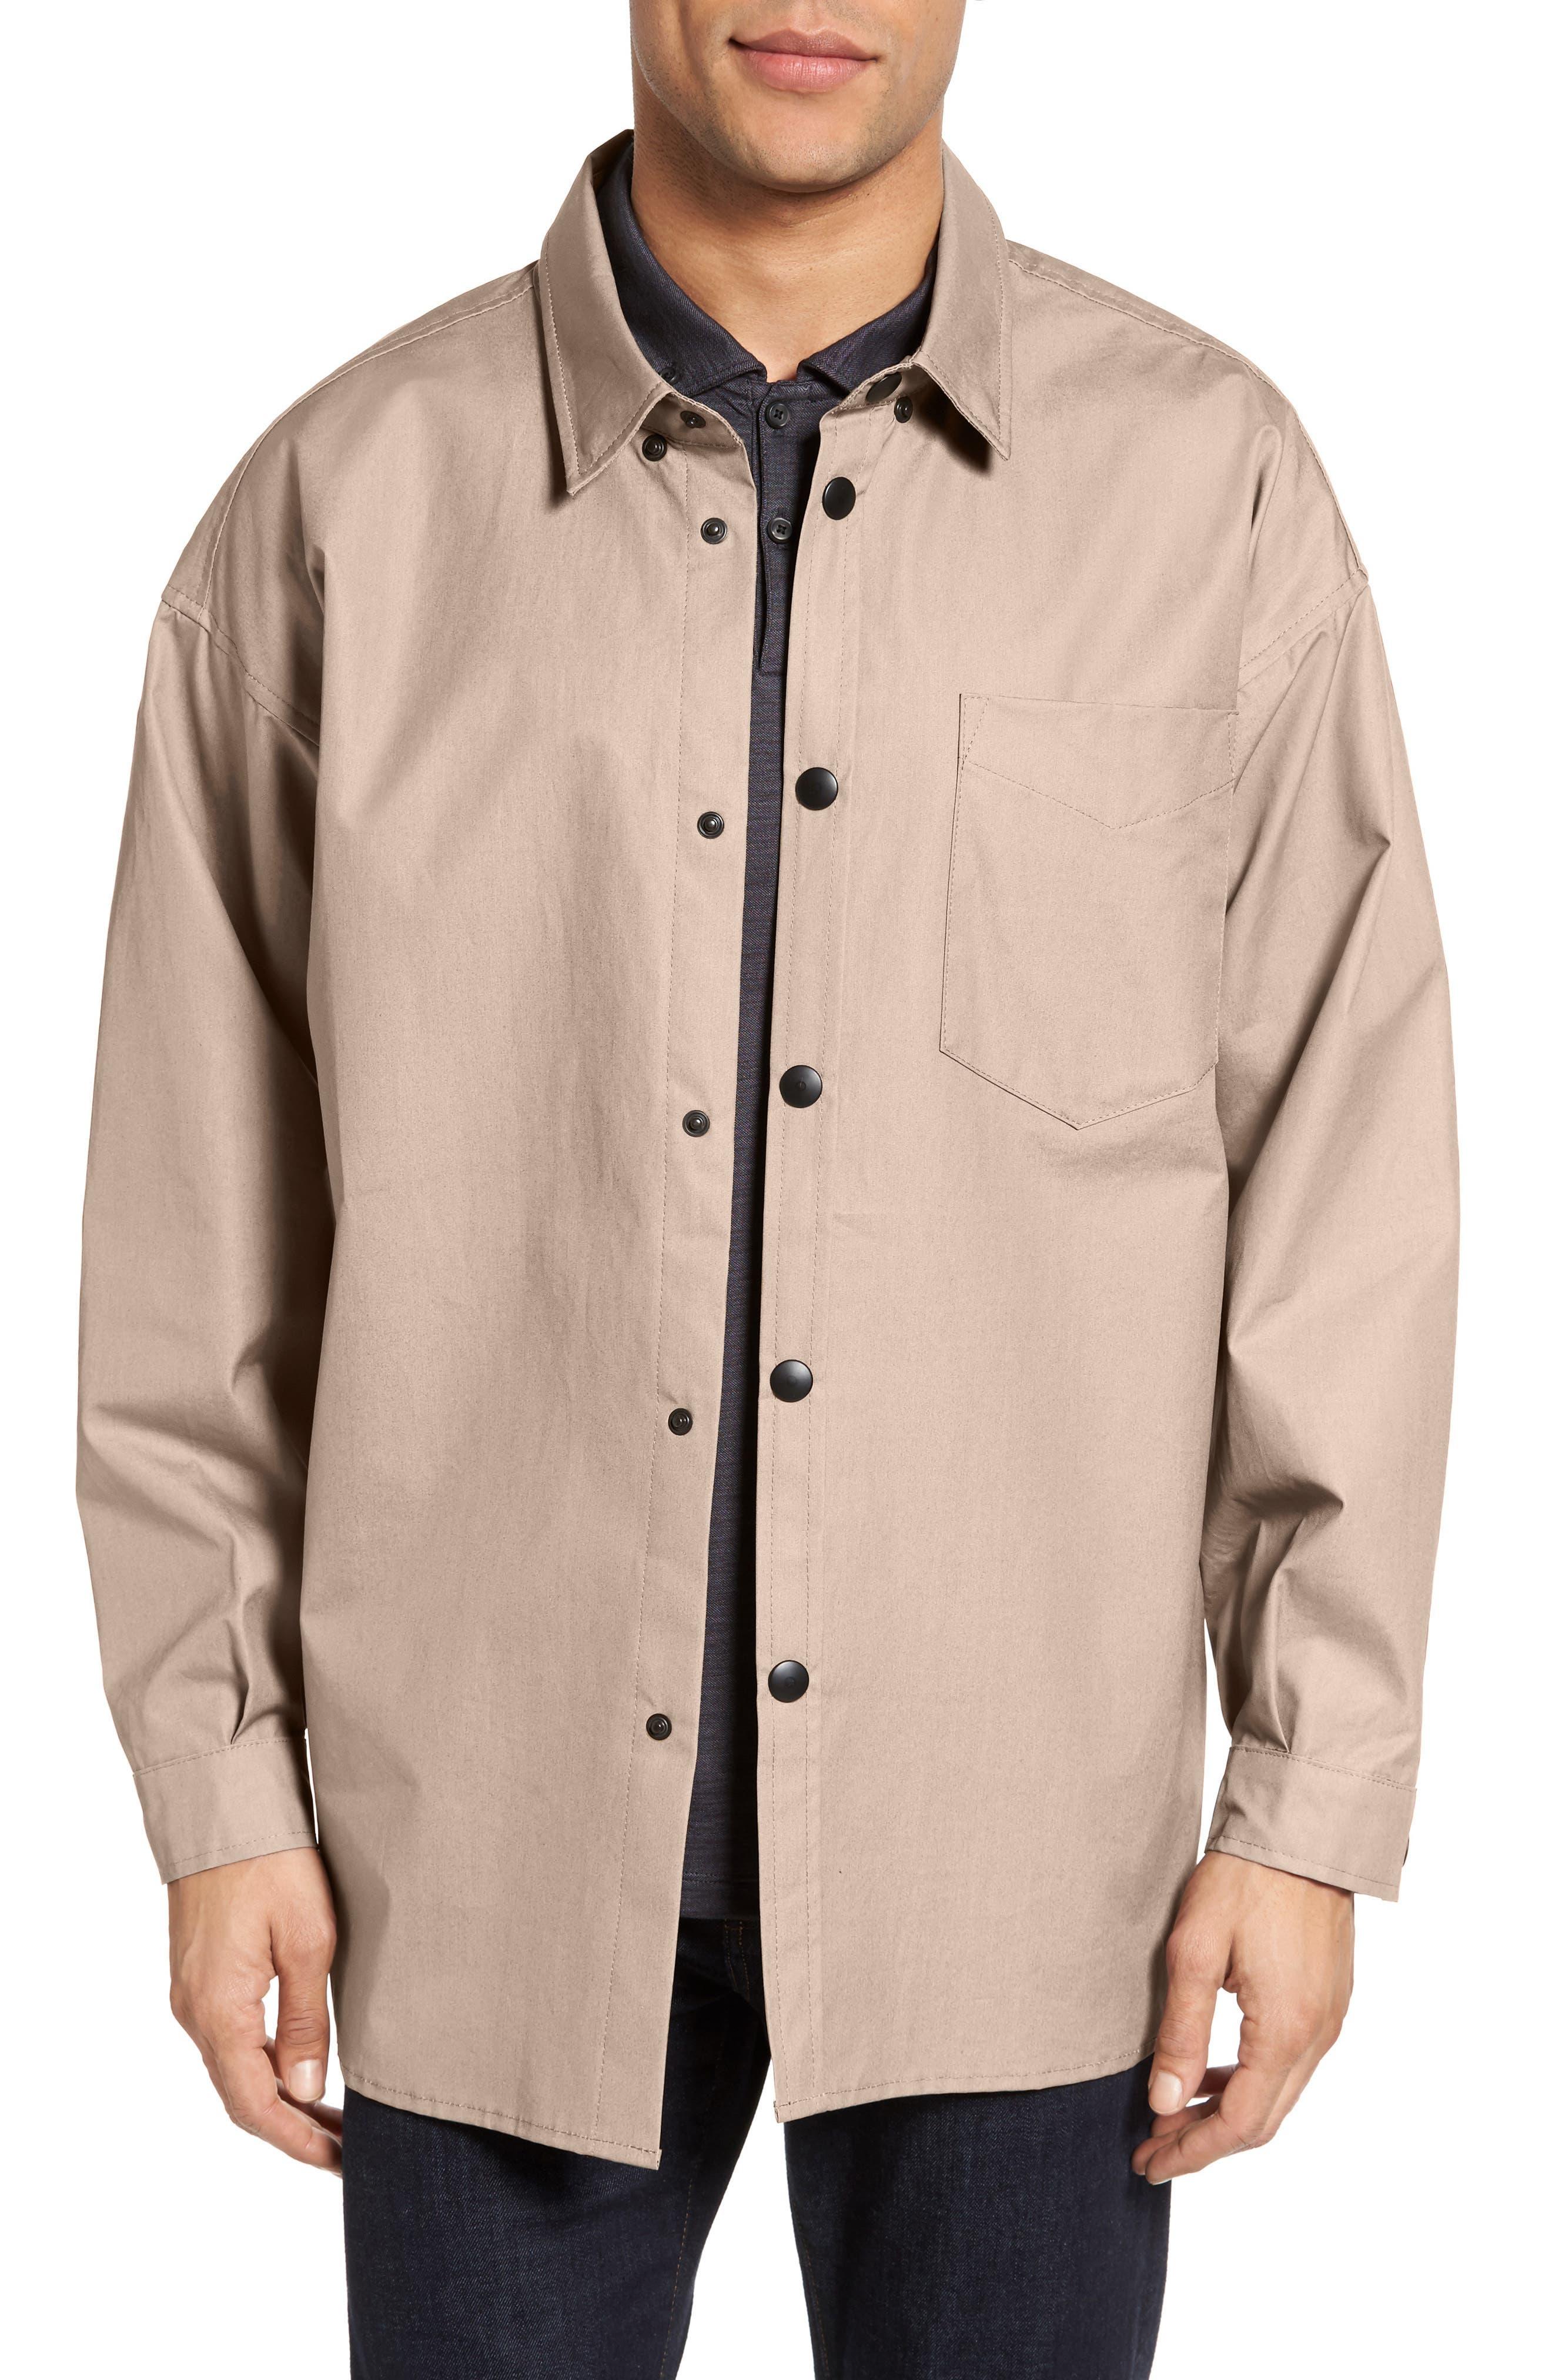 Lerum Relaxed Fit Shirt Jacket,                             Main thumbnail 3, color,